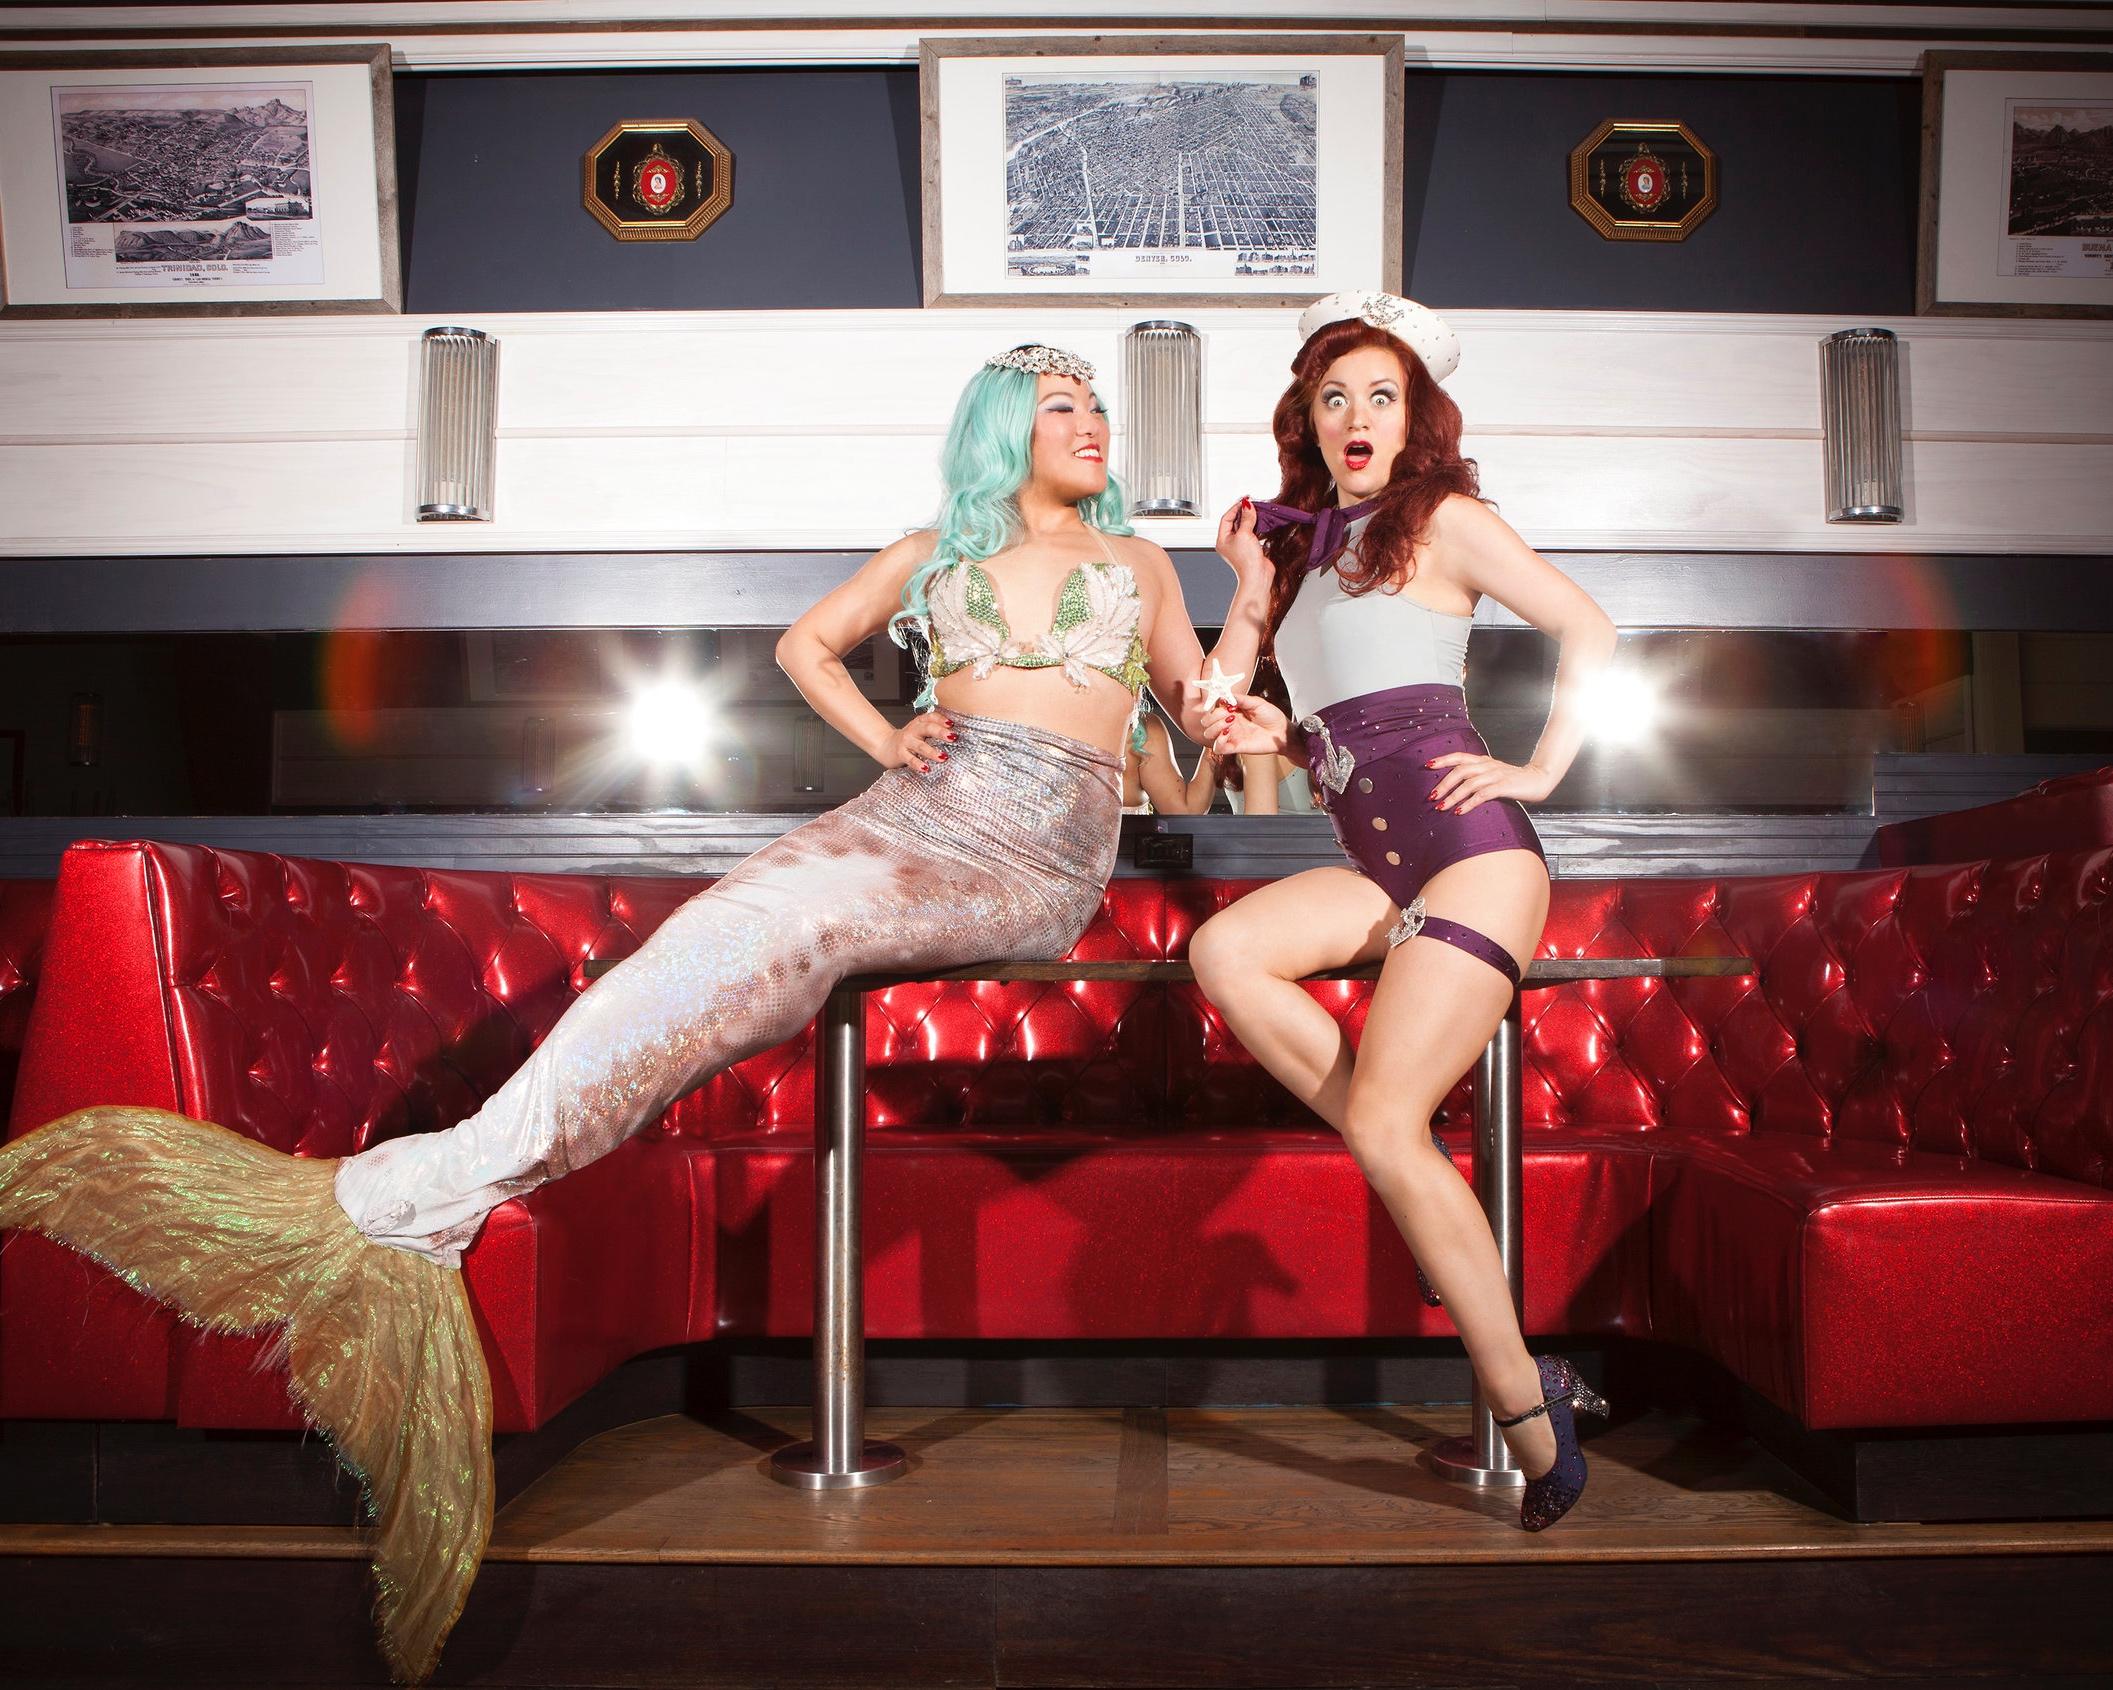 Minx Arcana & Francine at The Starliner